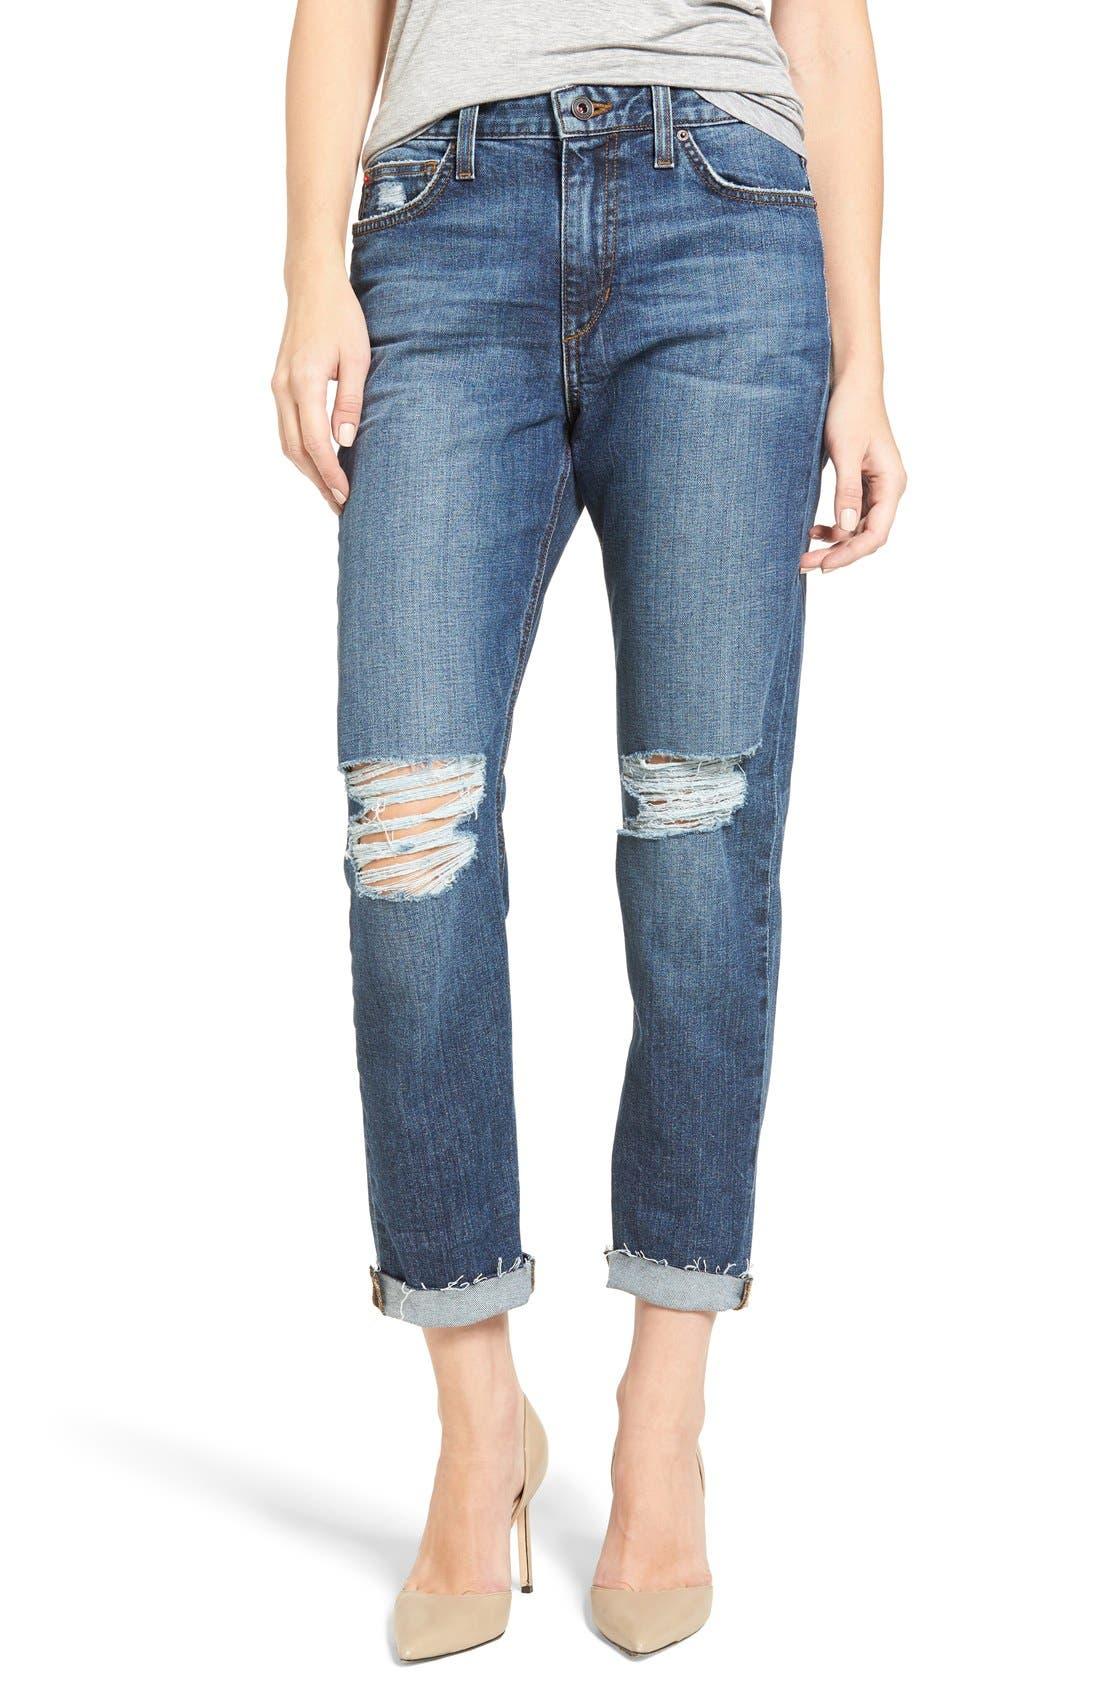 Joes Jeans Debbie High Waist Ripped Boyfriend Jeans,                         Main,                         color, Coppola